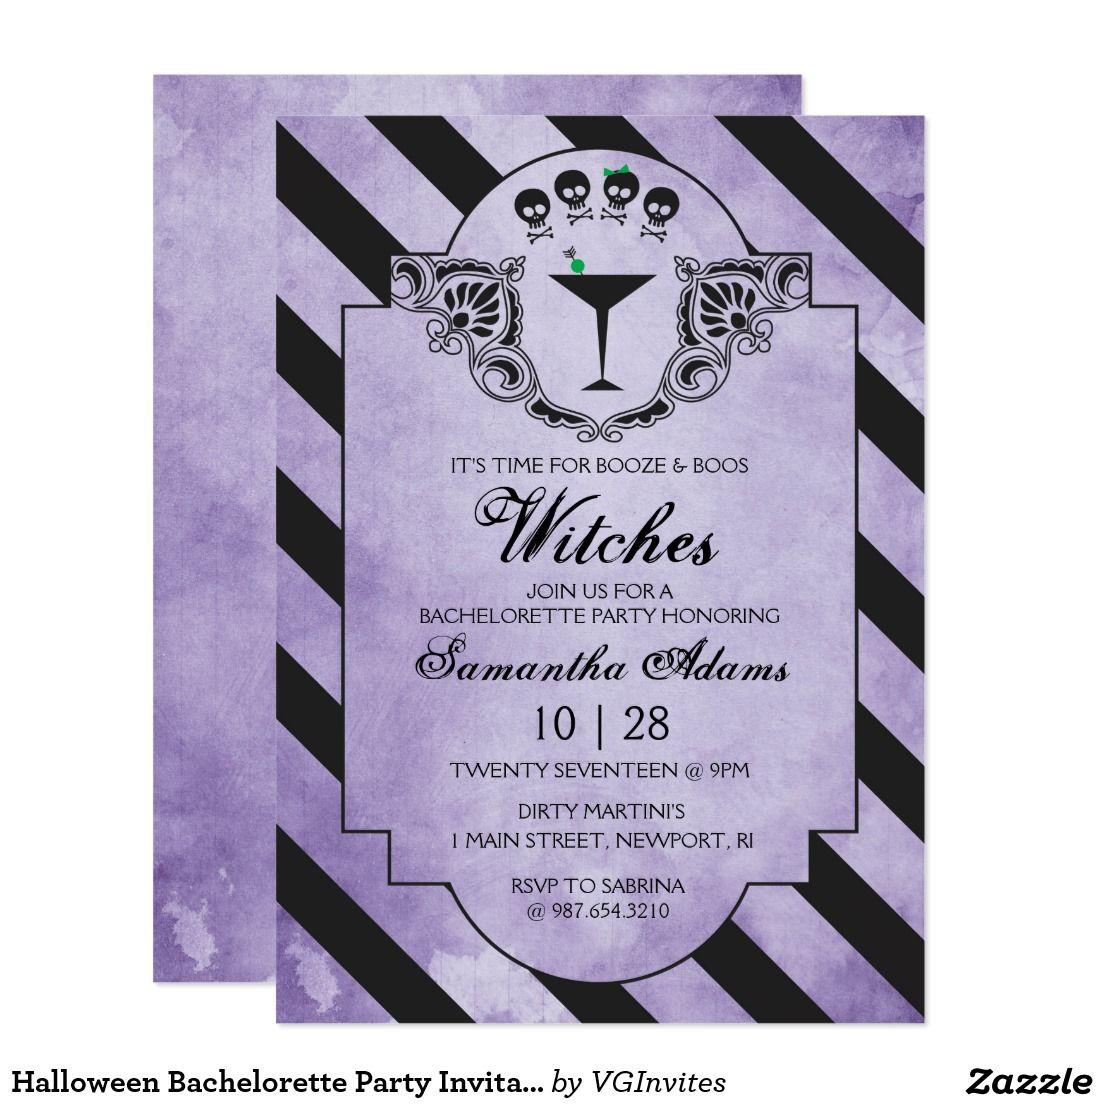 Halloween Bachelorette Party Invitation - Purple | Bachelorette ...